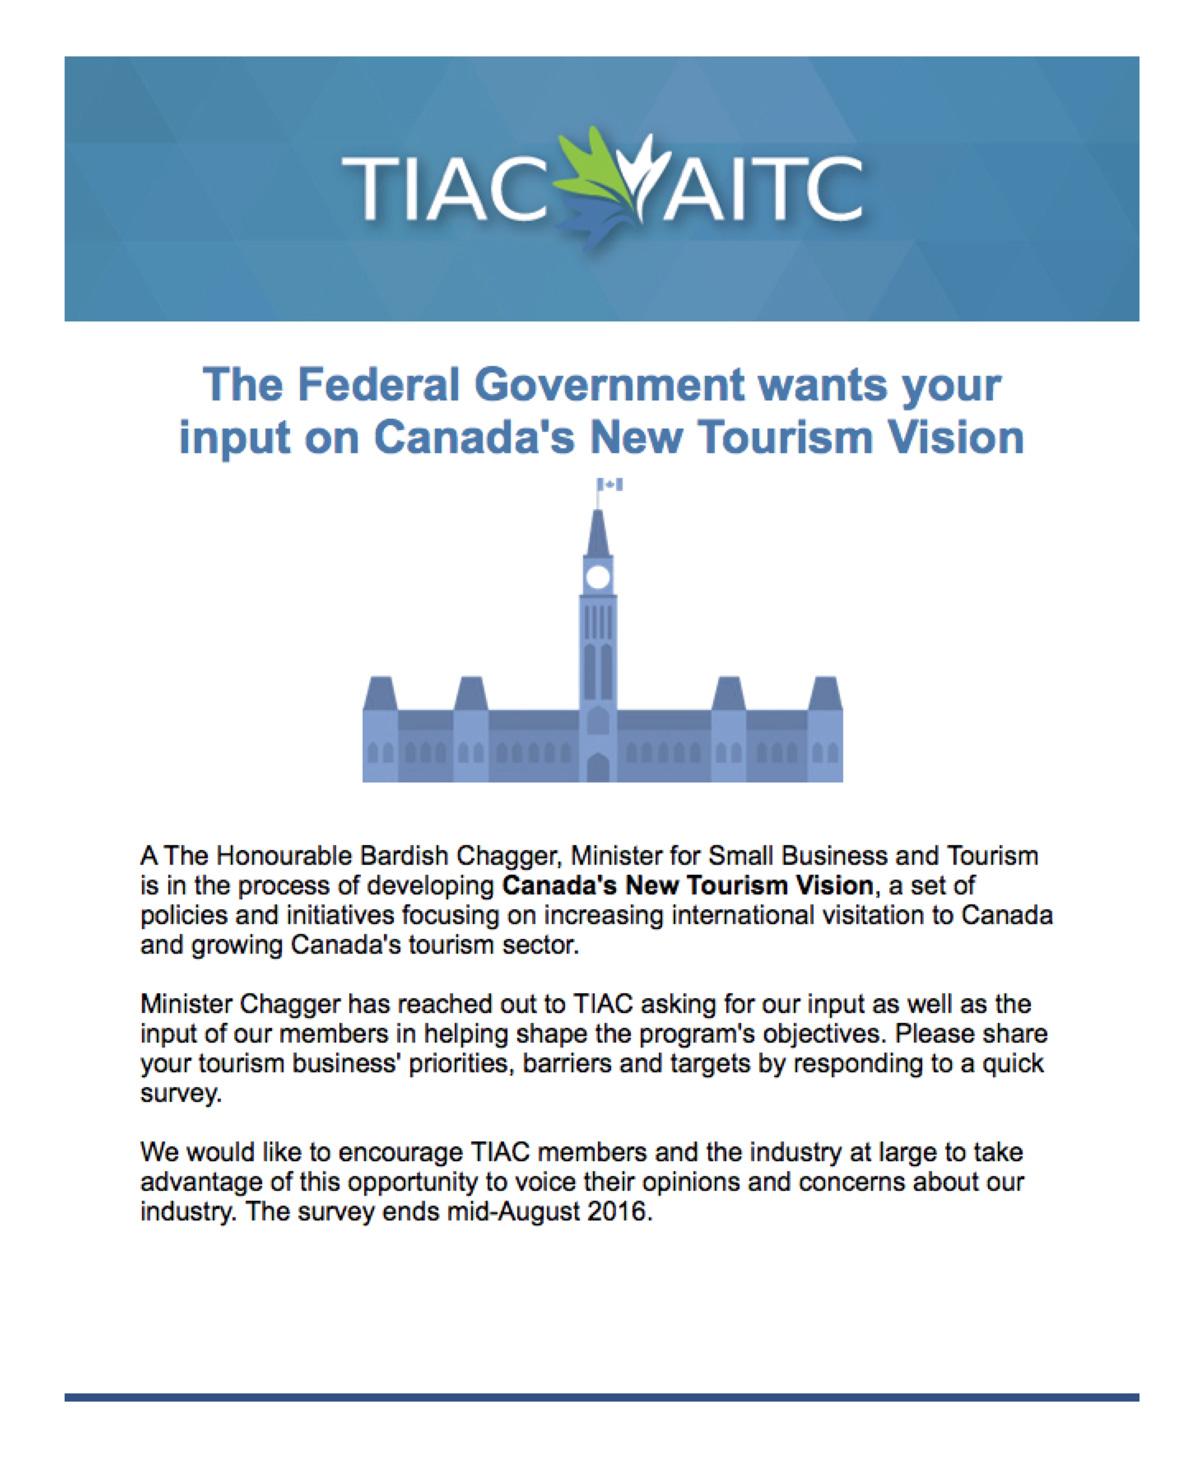 Canada's New Tourism Vision survey